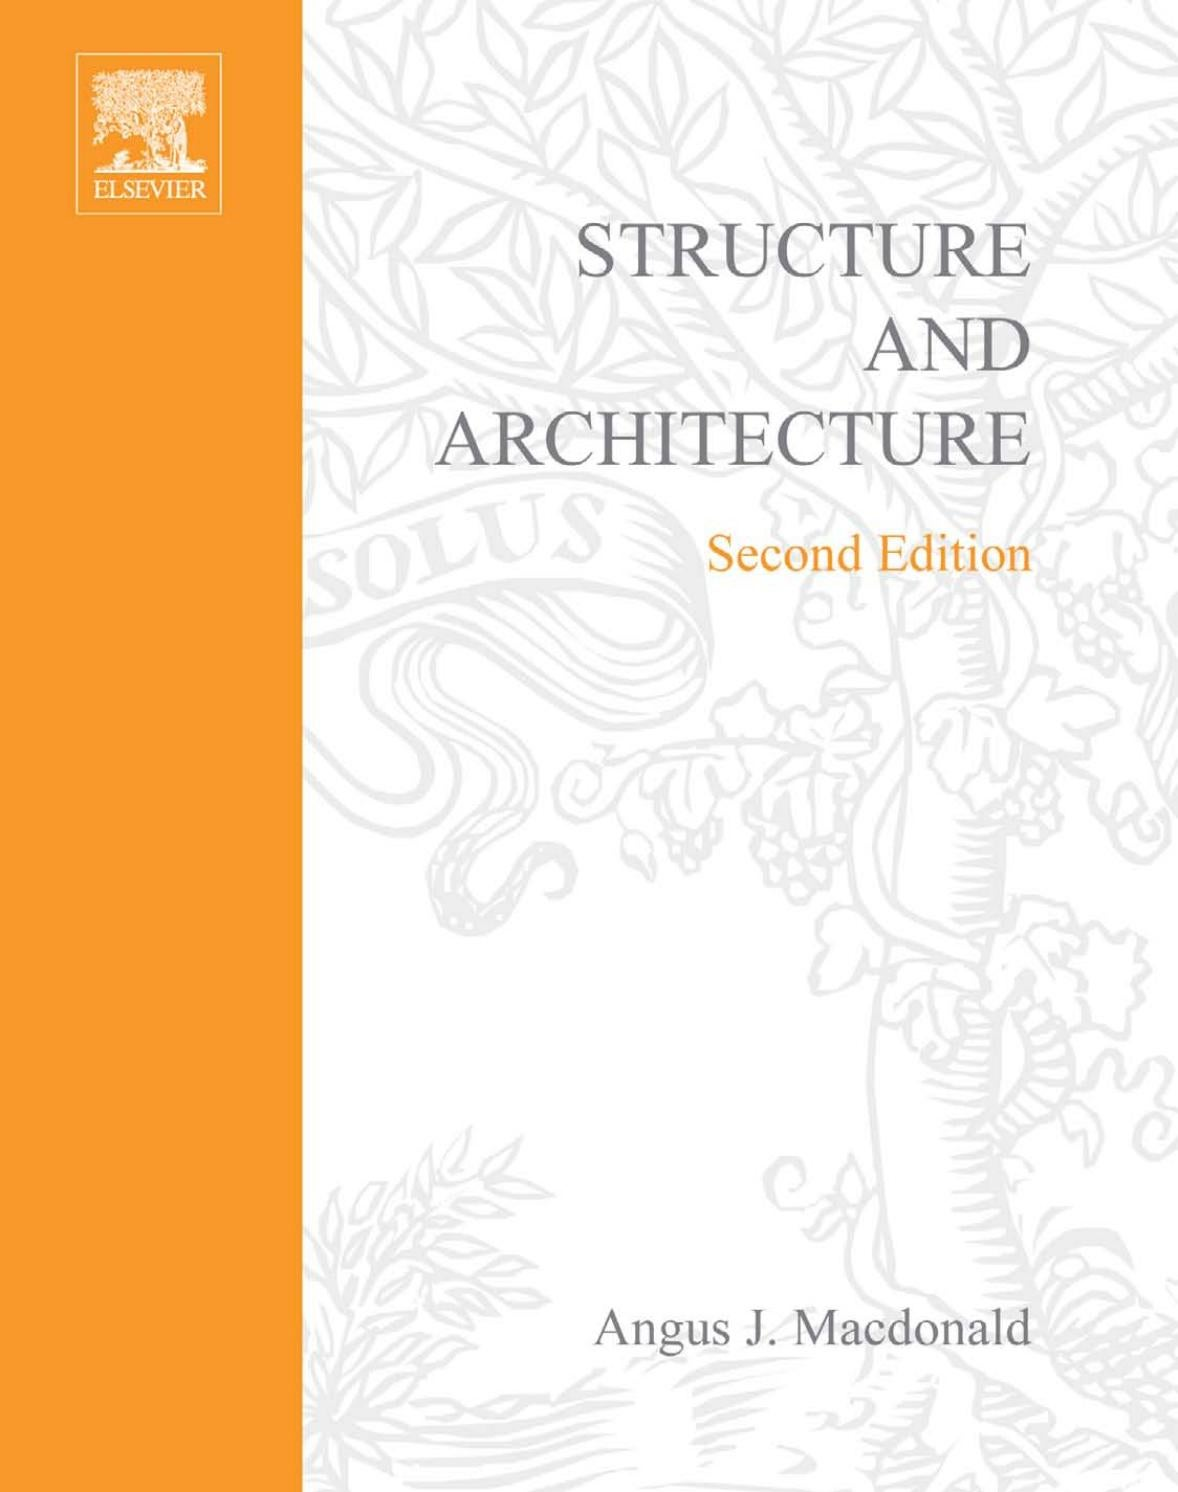 Structure And Architecture Angus J Macdonald By Sebastian Nunez B Issuu